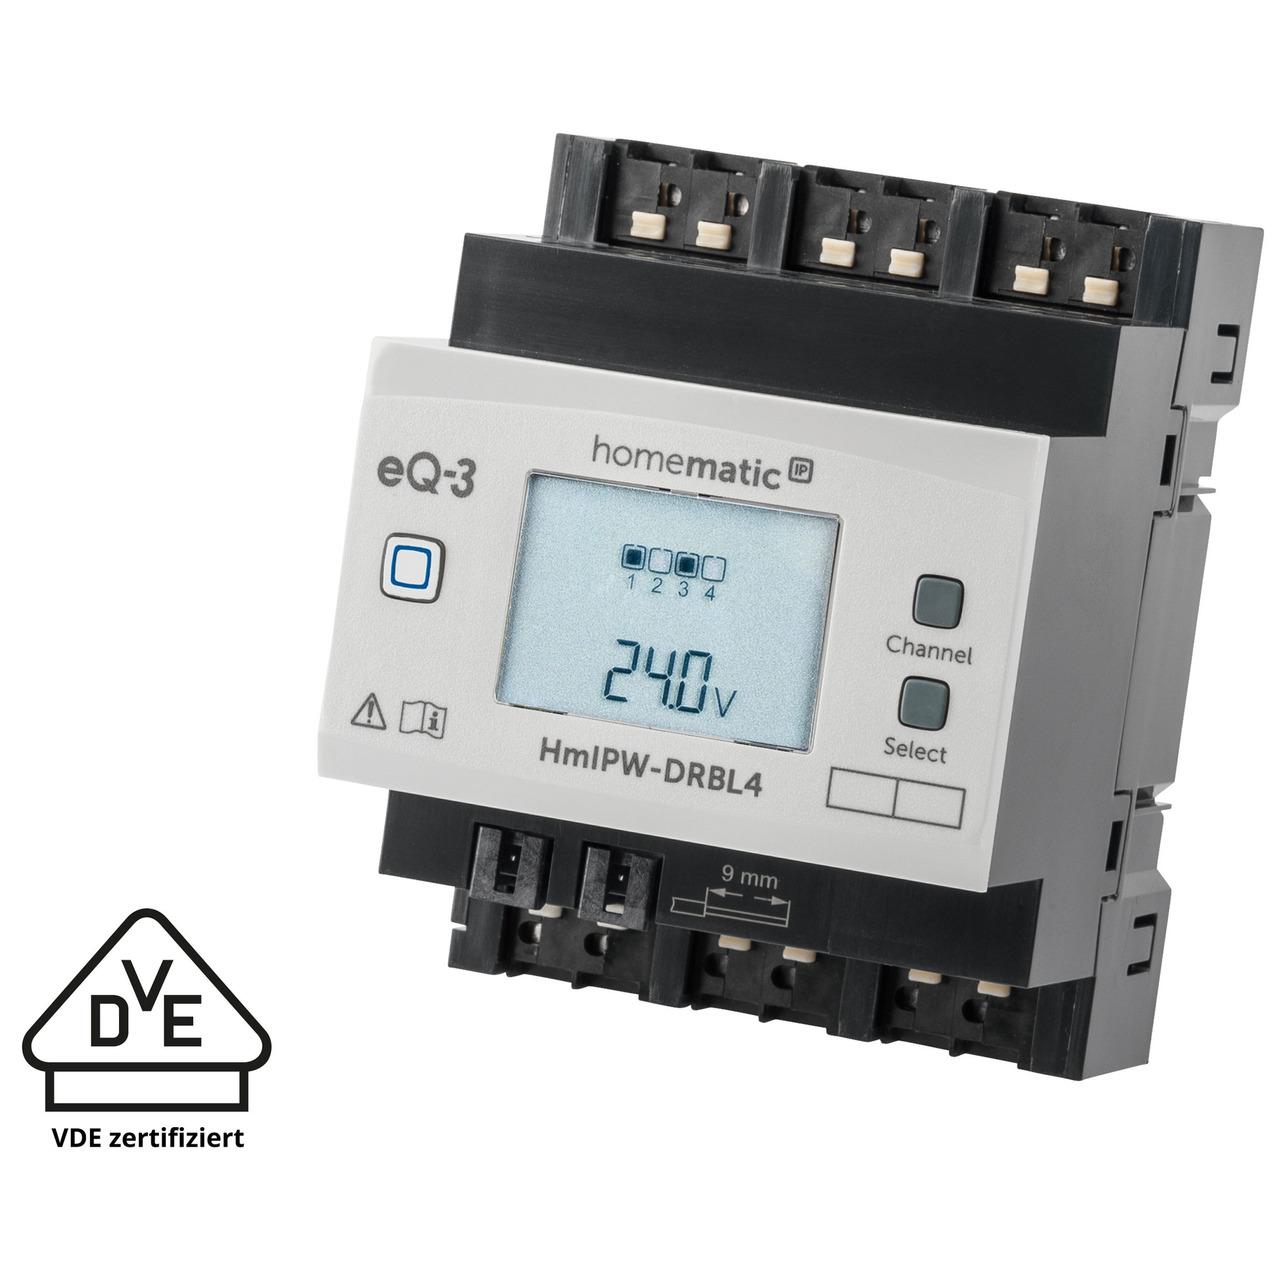 Homematic IP Wired 4-fach-Jalousie-Rollladenaktor HmIPW-DRBL4- VDE zertifiziert